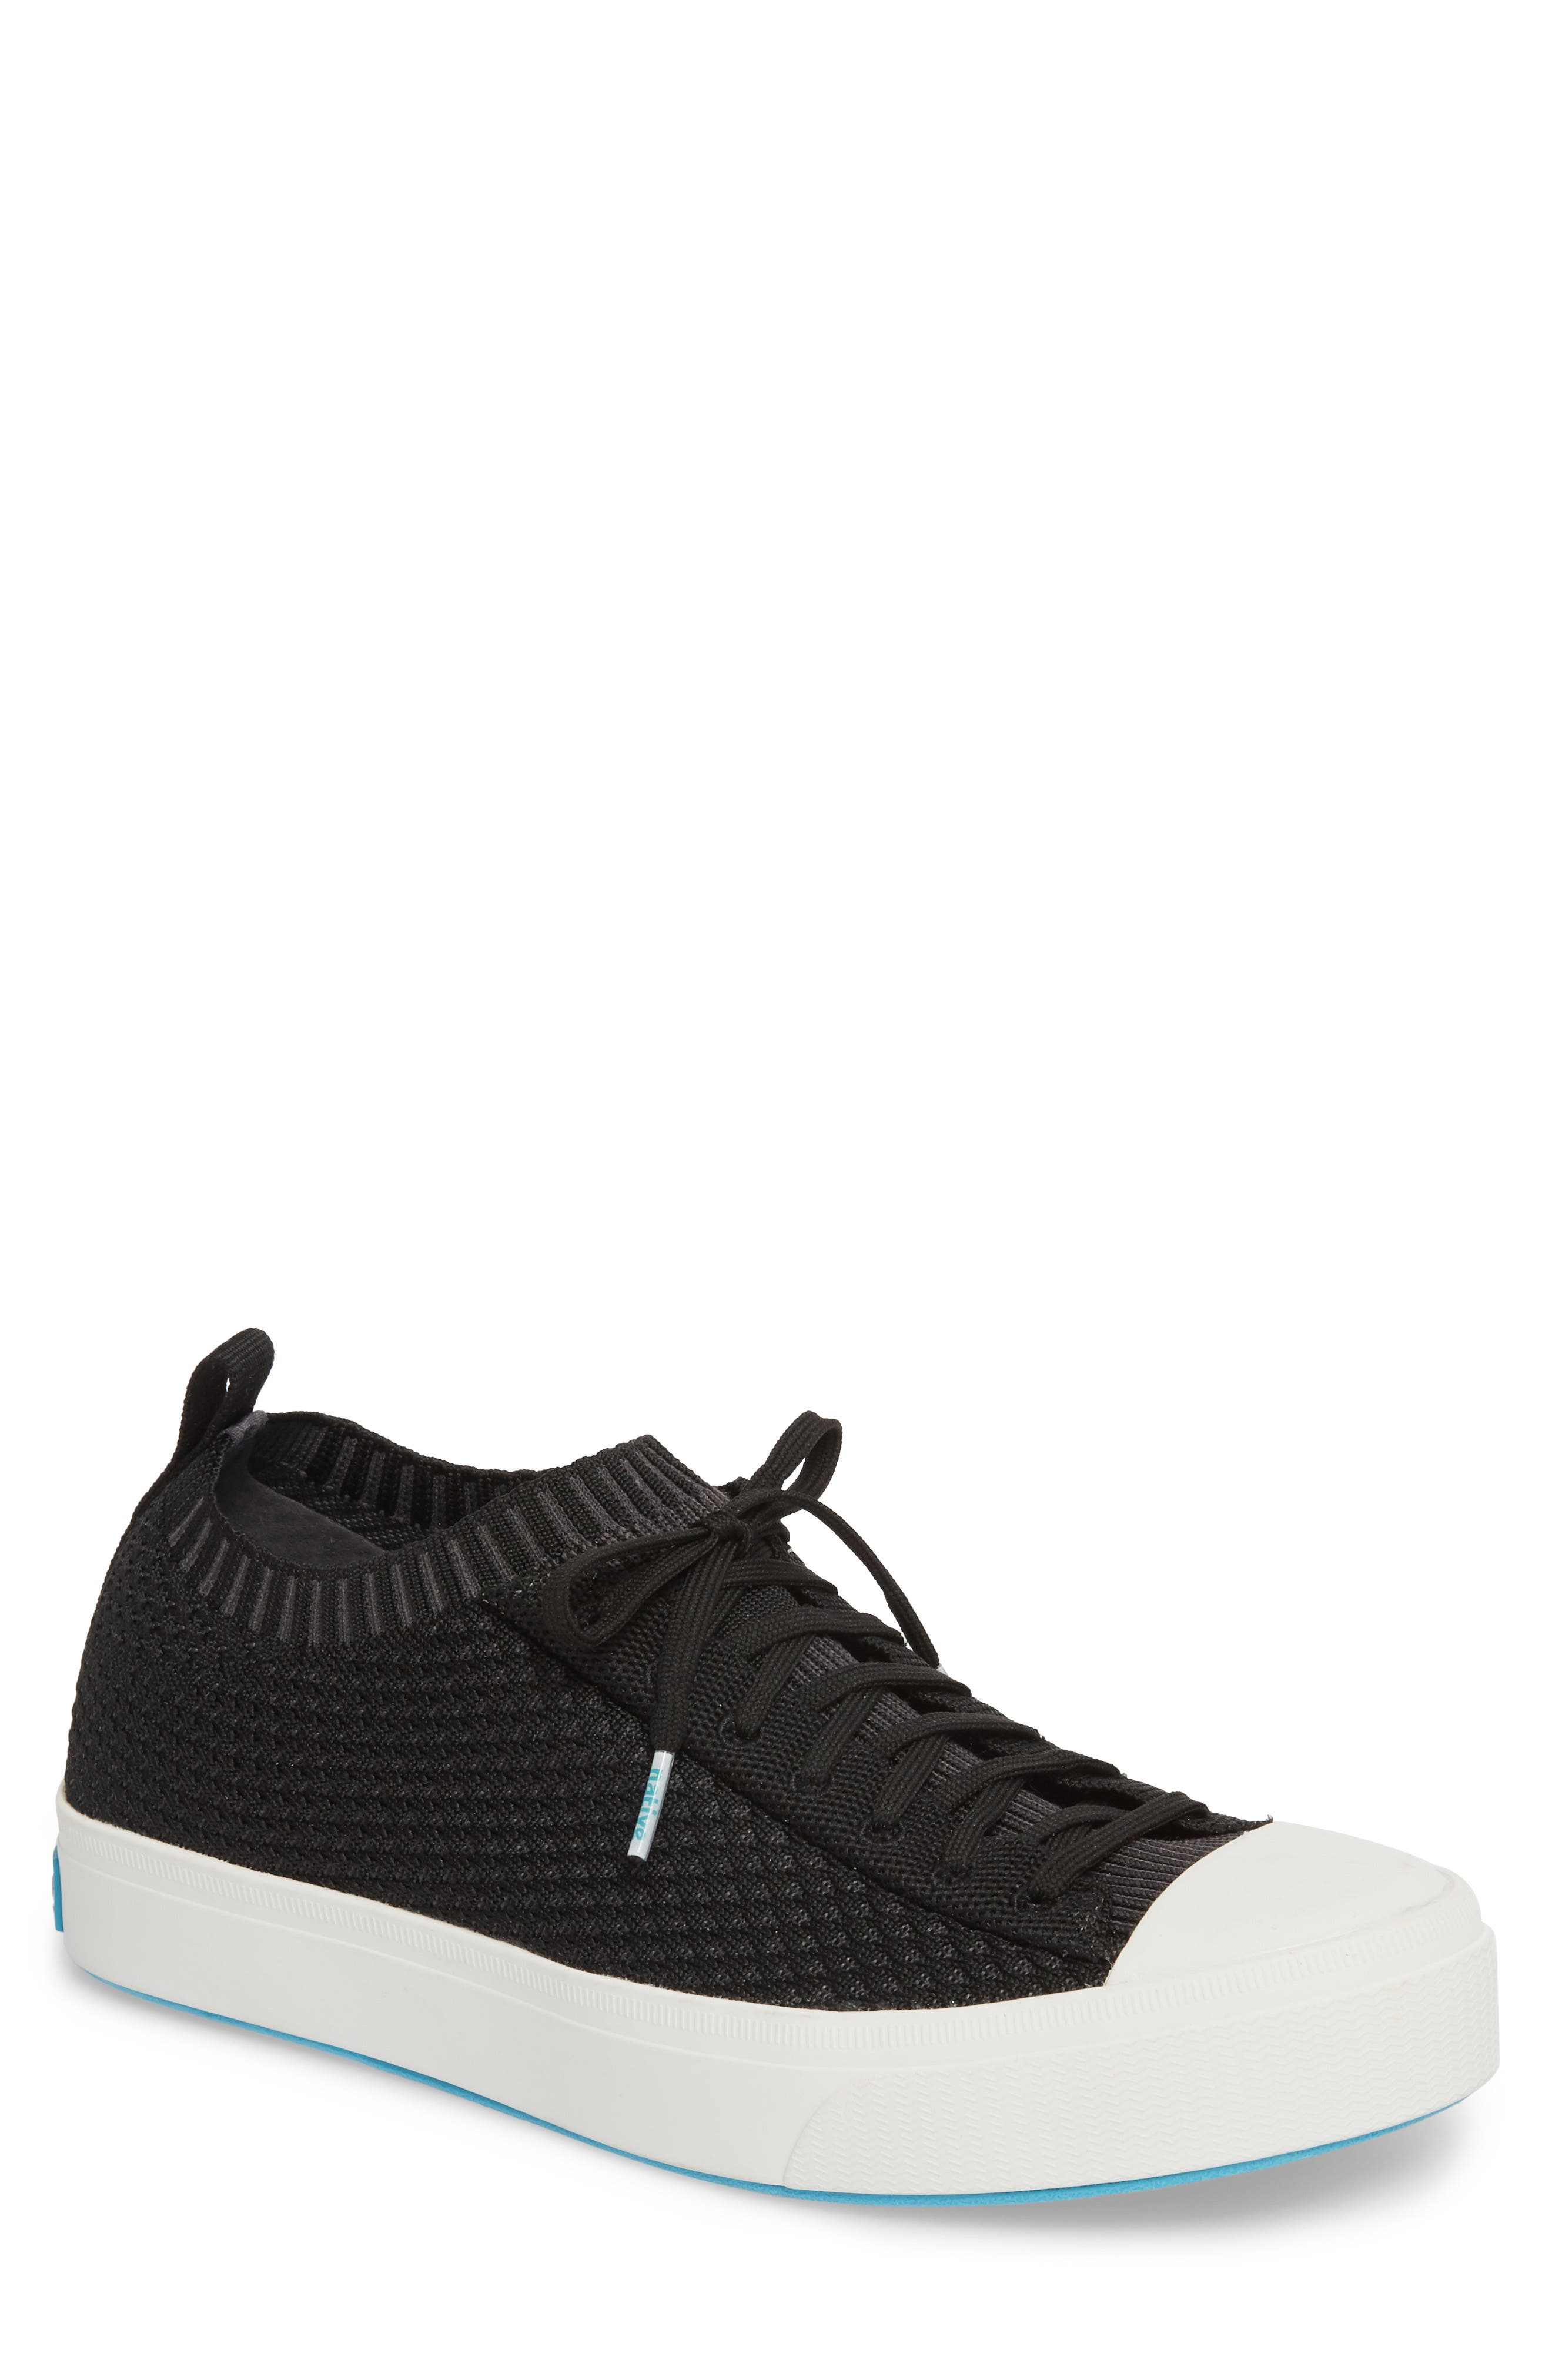 Native Shoes Jefferson 2.0 Liteknit Lace-Up Sneaker, Black